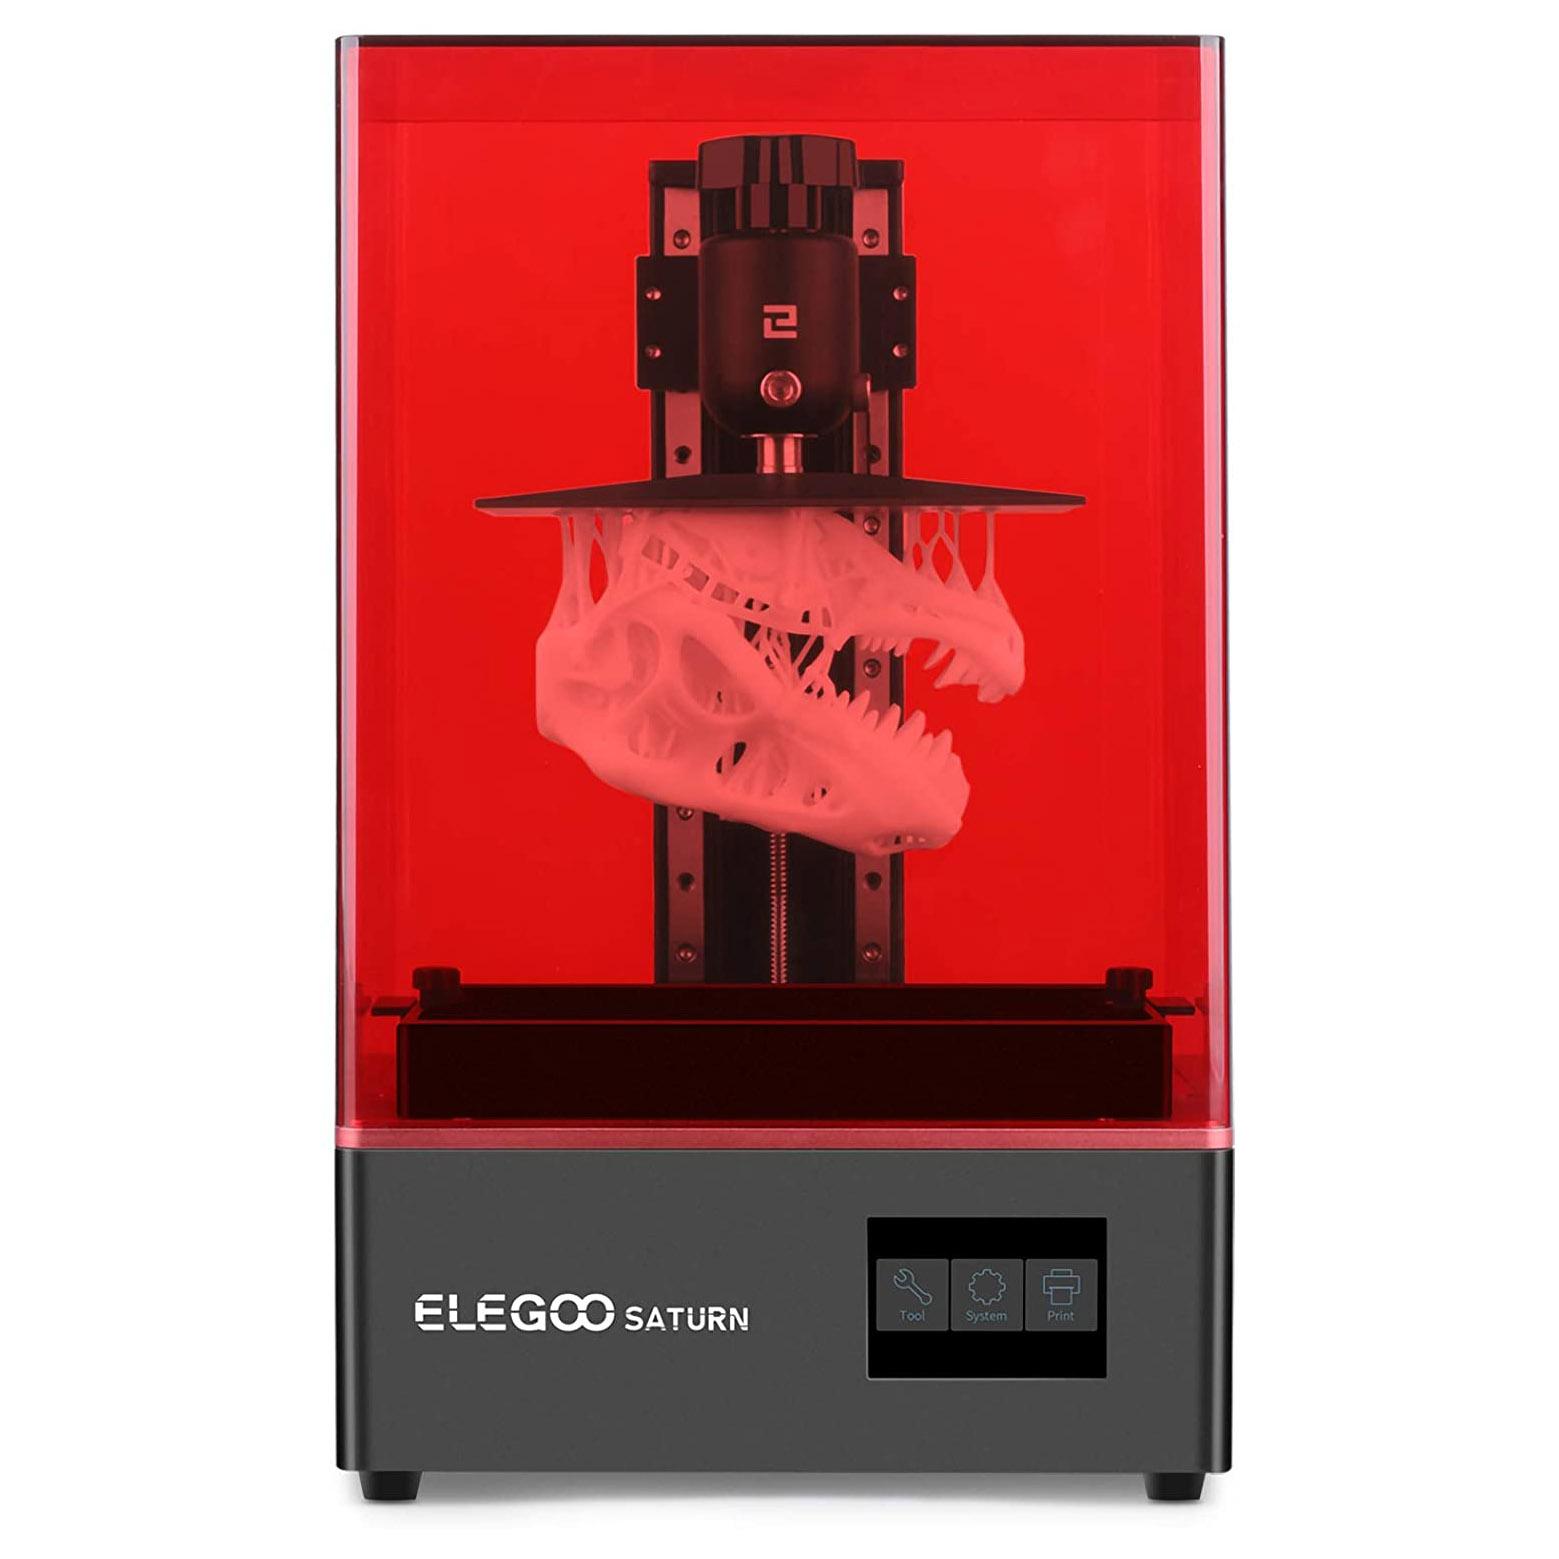 ELEGOO Saturn 4K Monochrome LCD 3D Printer 8.9″